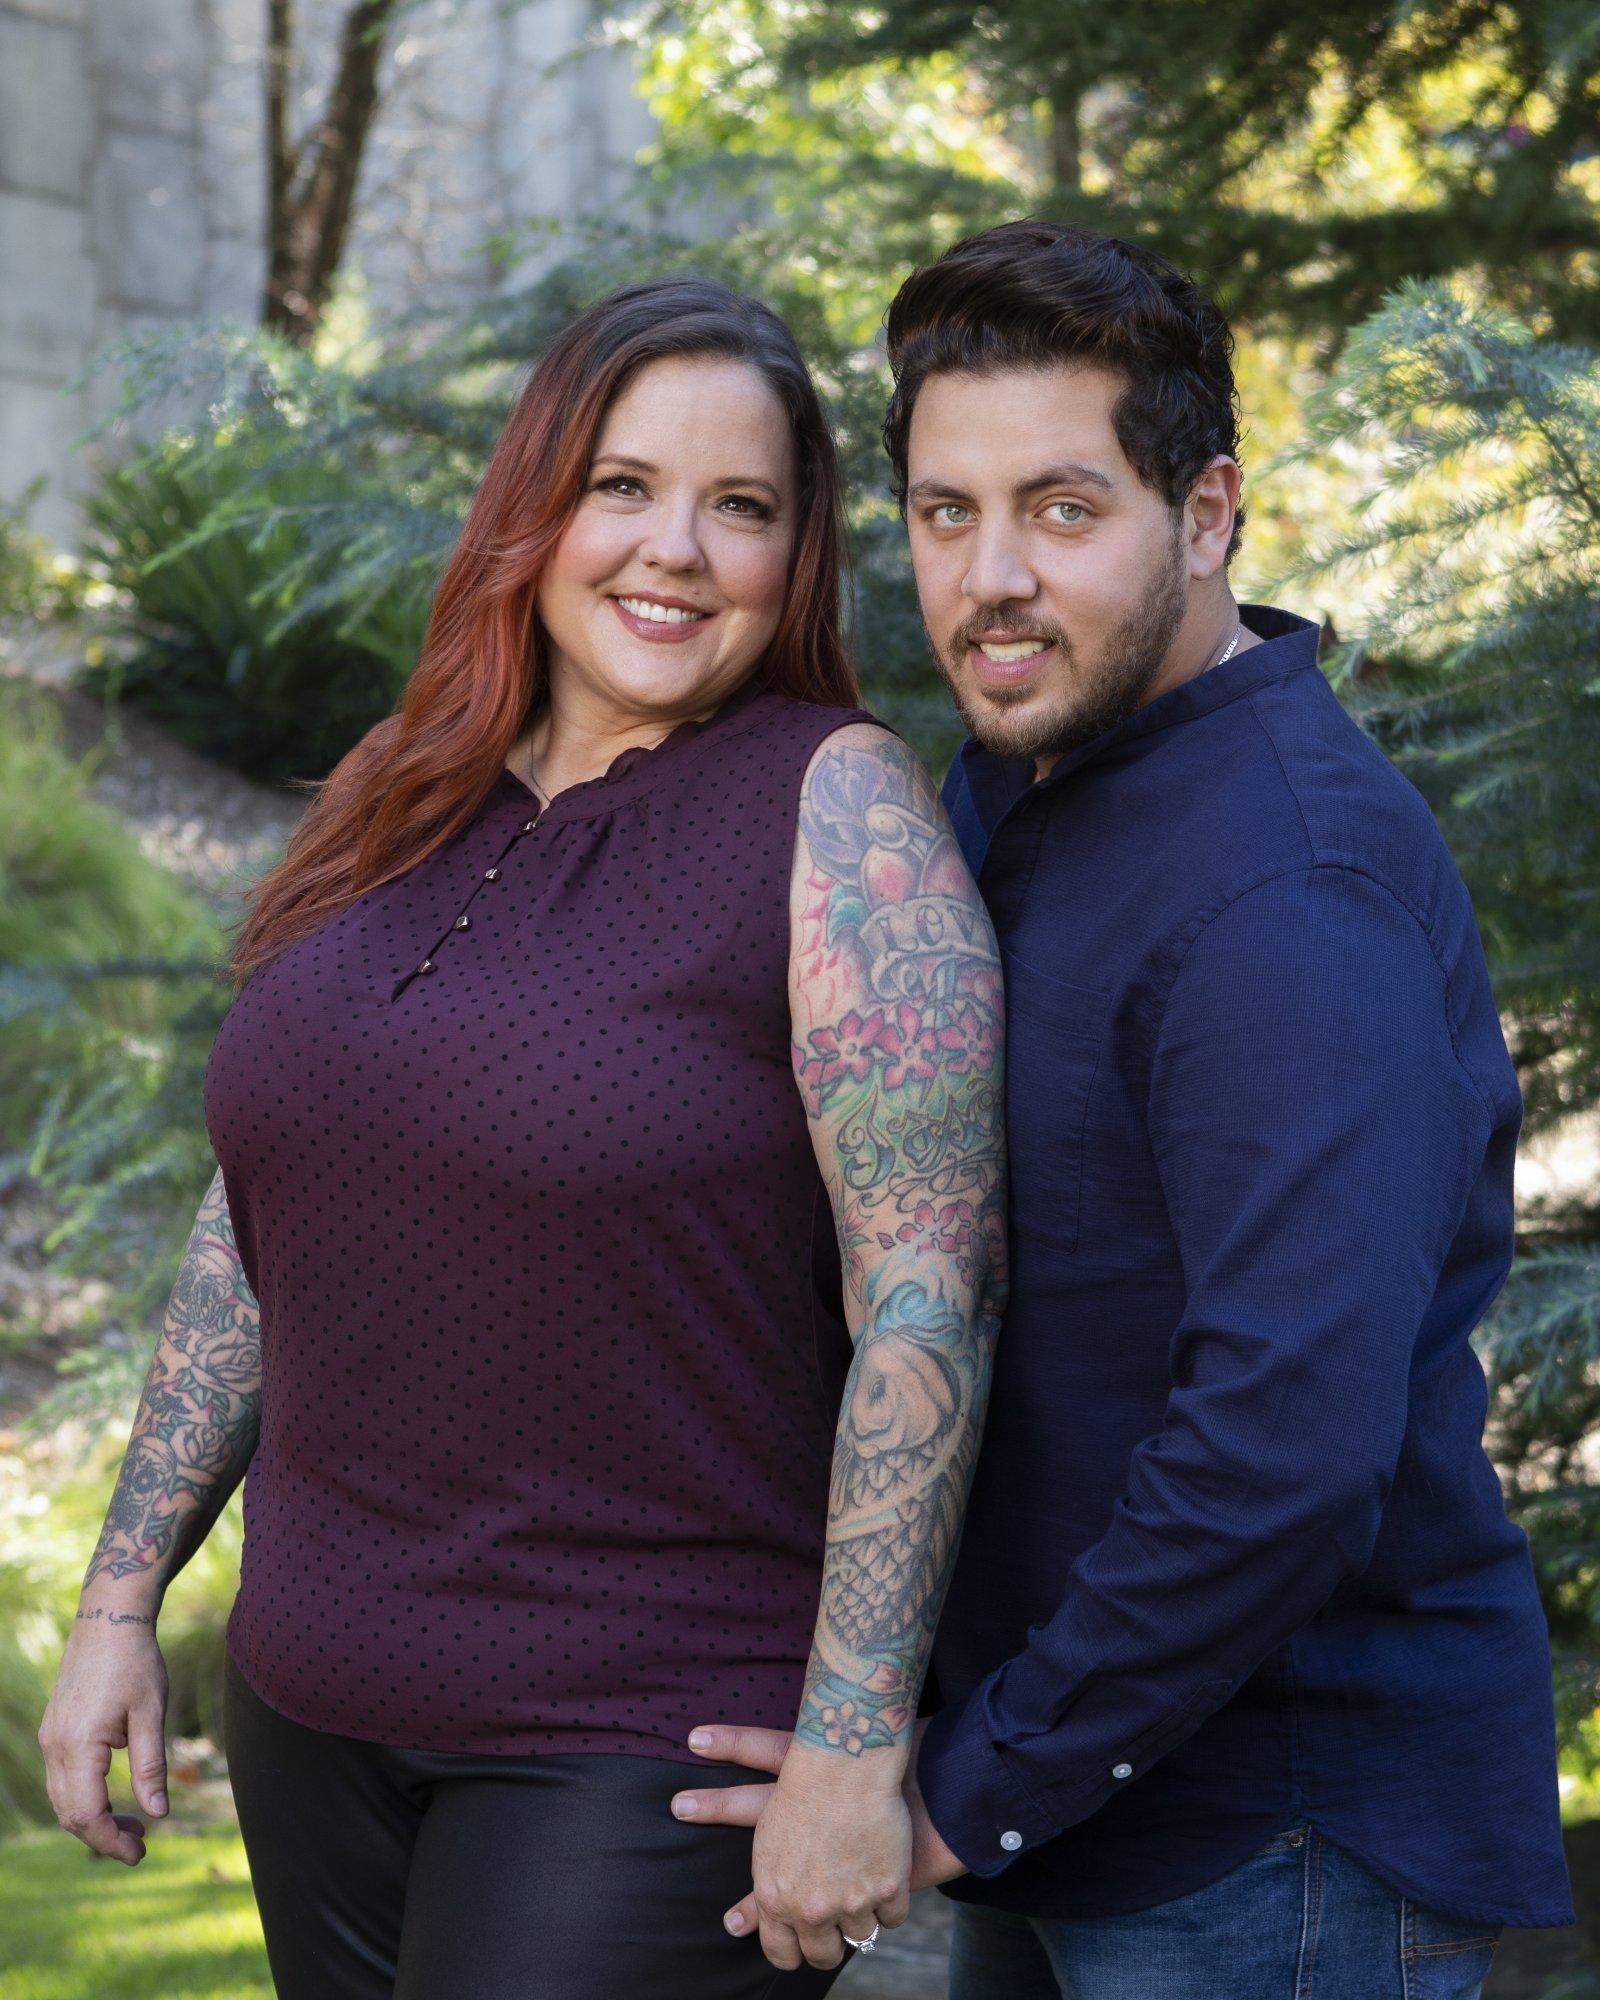 90 Day Fiance Season 8 couple Rebecca Parrott and Zied Hakimi